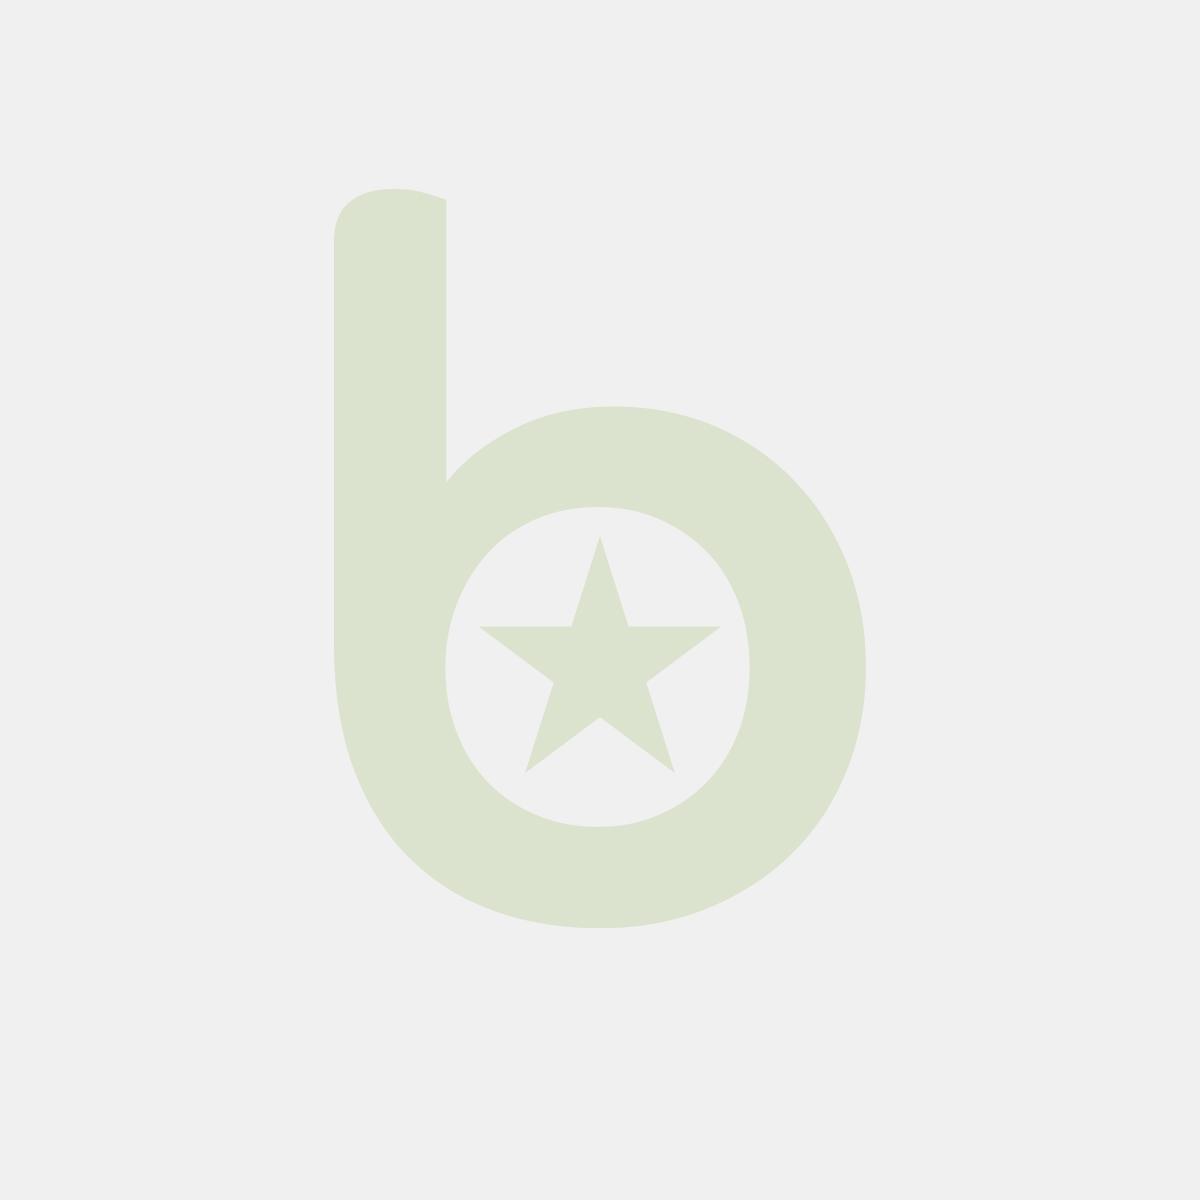 Rondel Profi Line Bez Pokrywki 3 L; Śr. 200 X 90 H